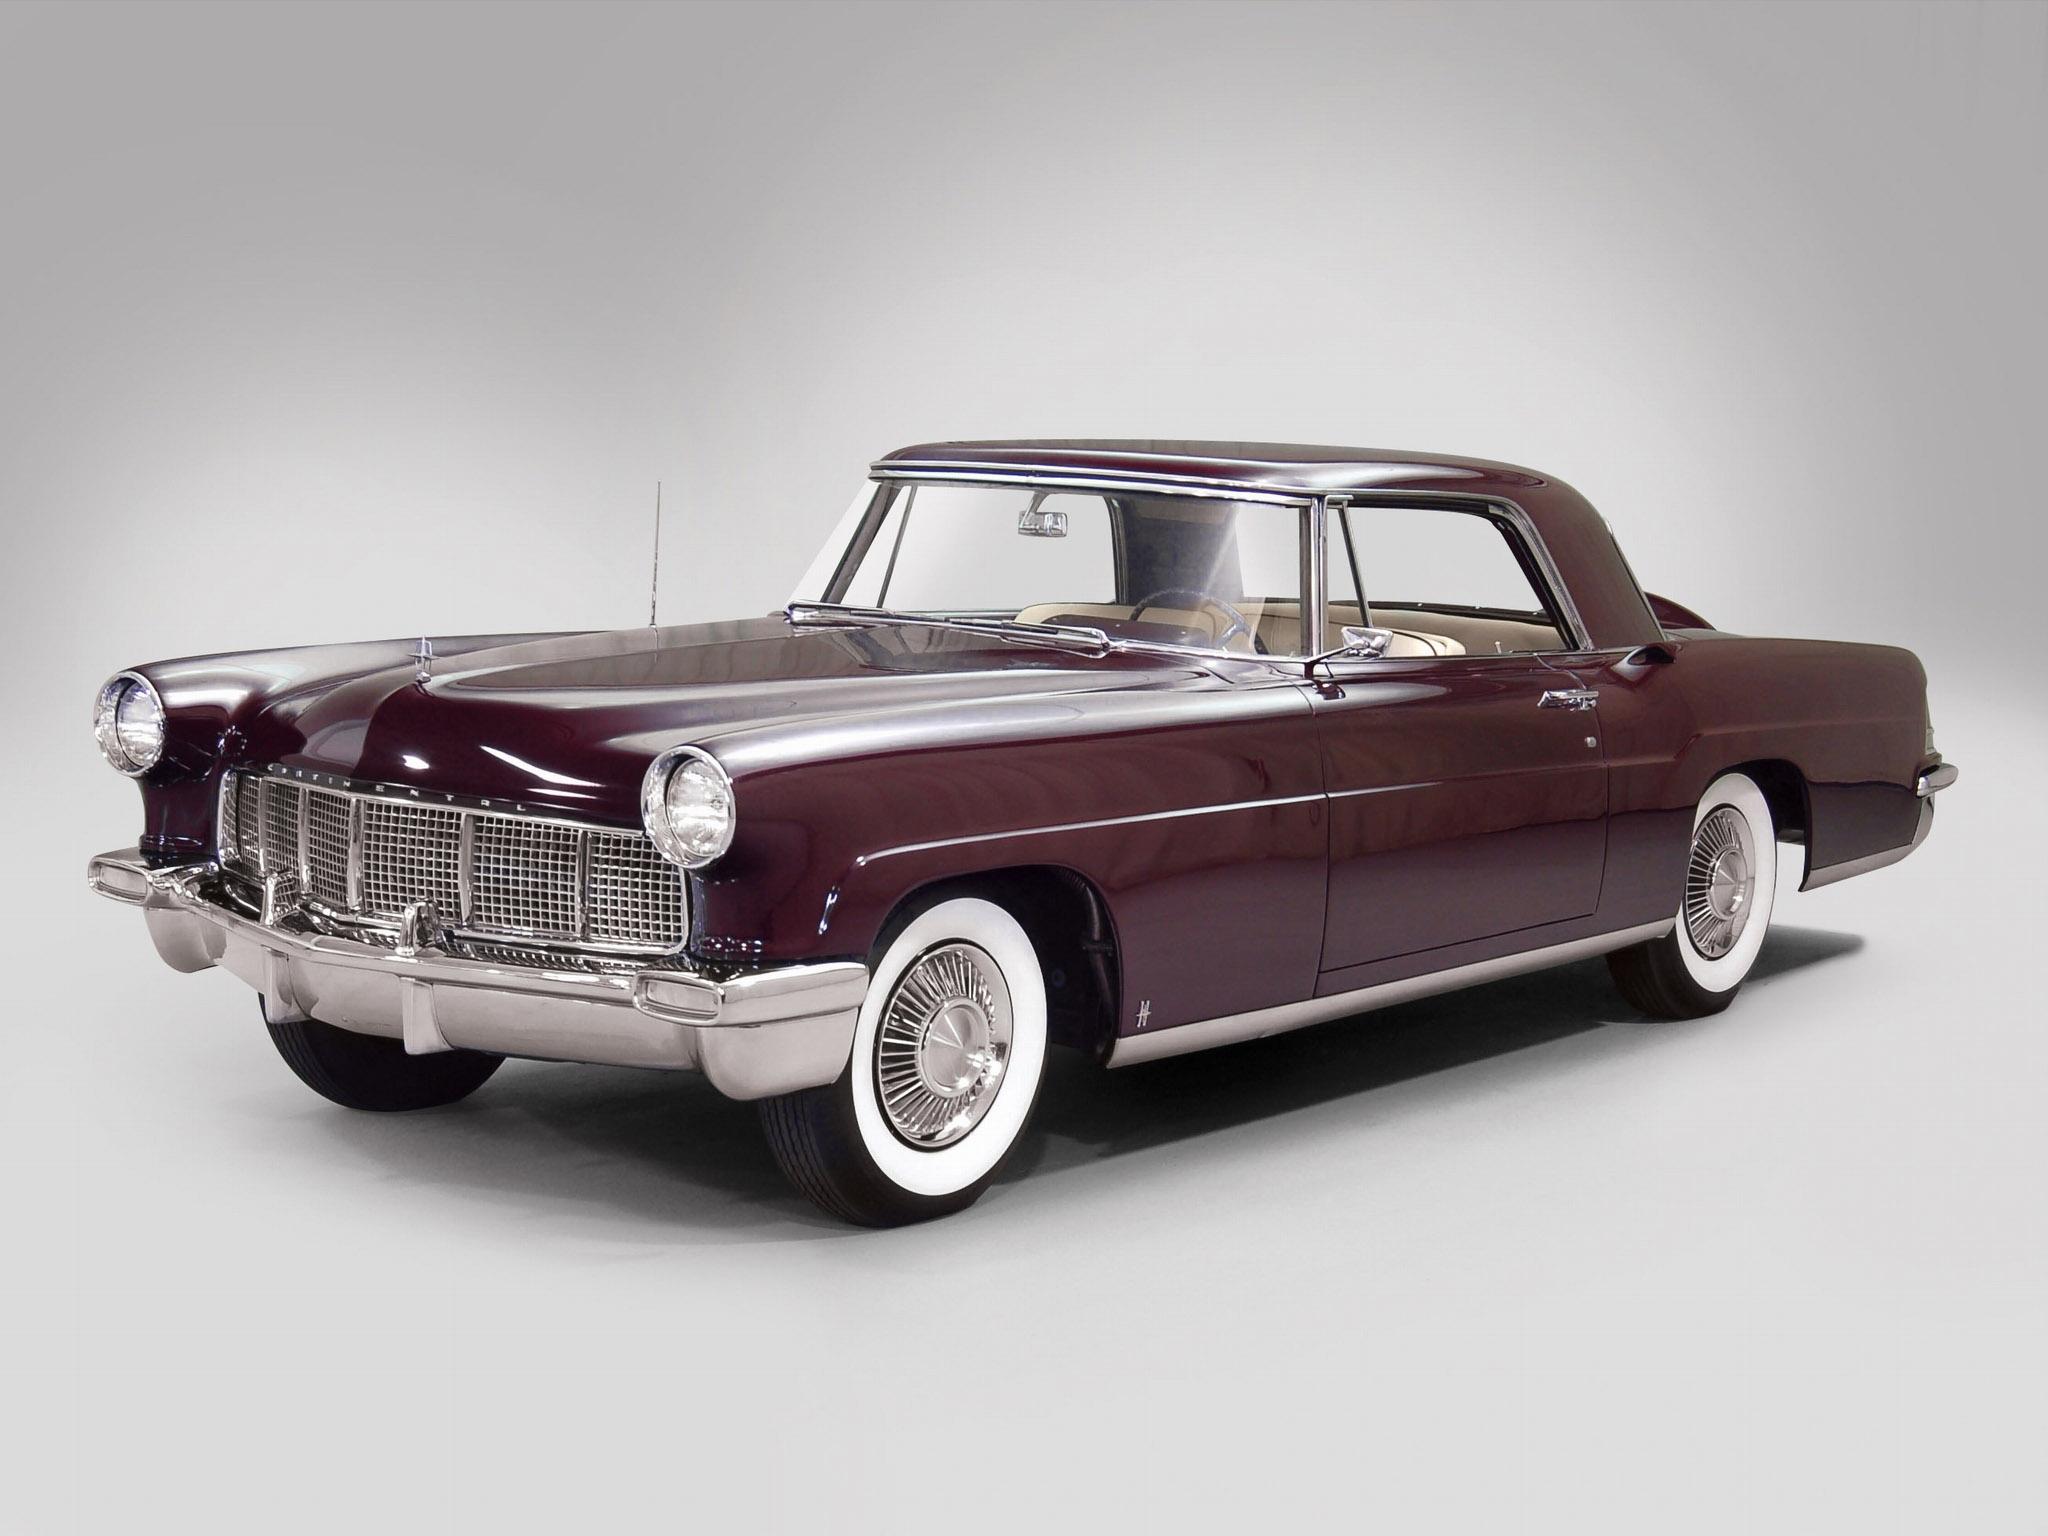 Wallpaper : coupe, Cadillac, Convertible, Sedan ...